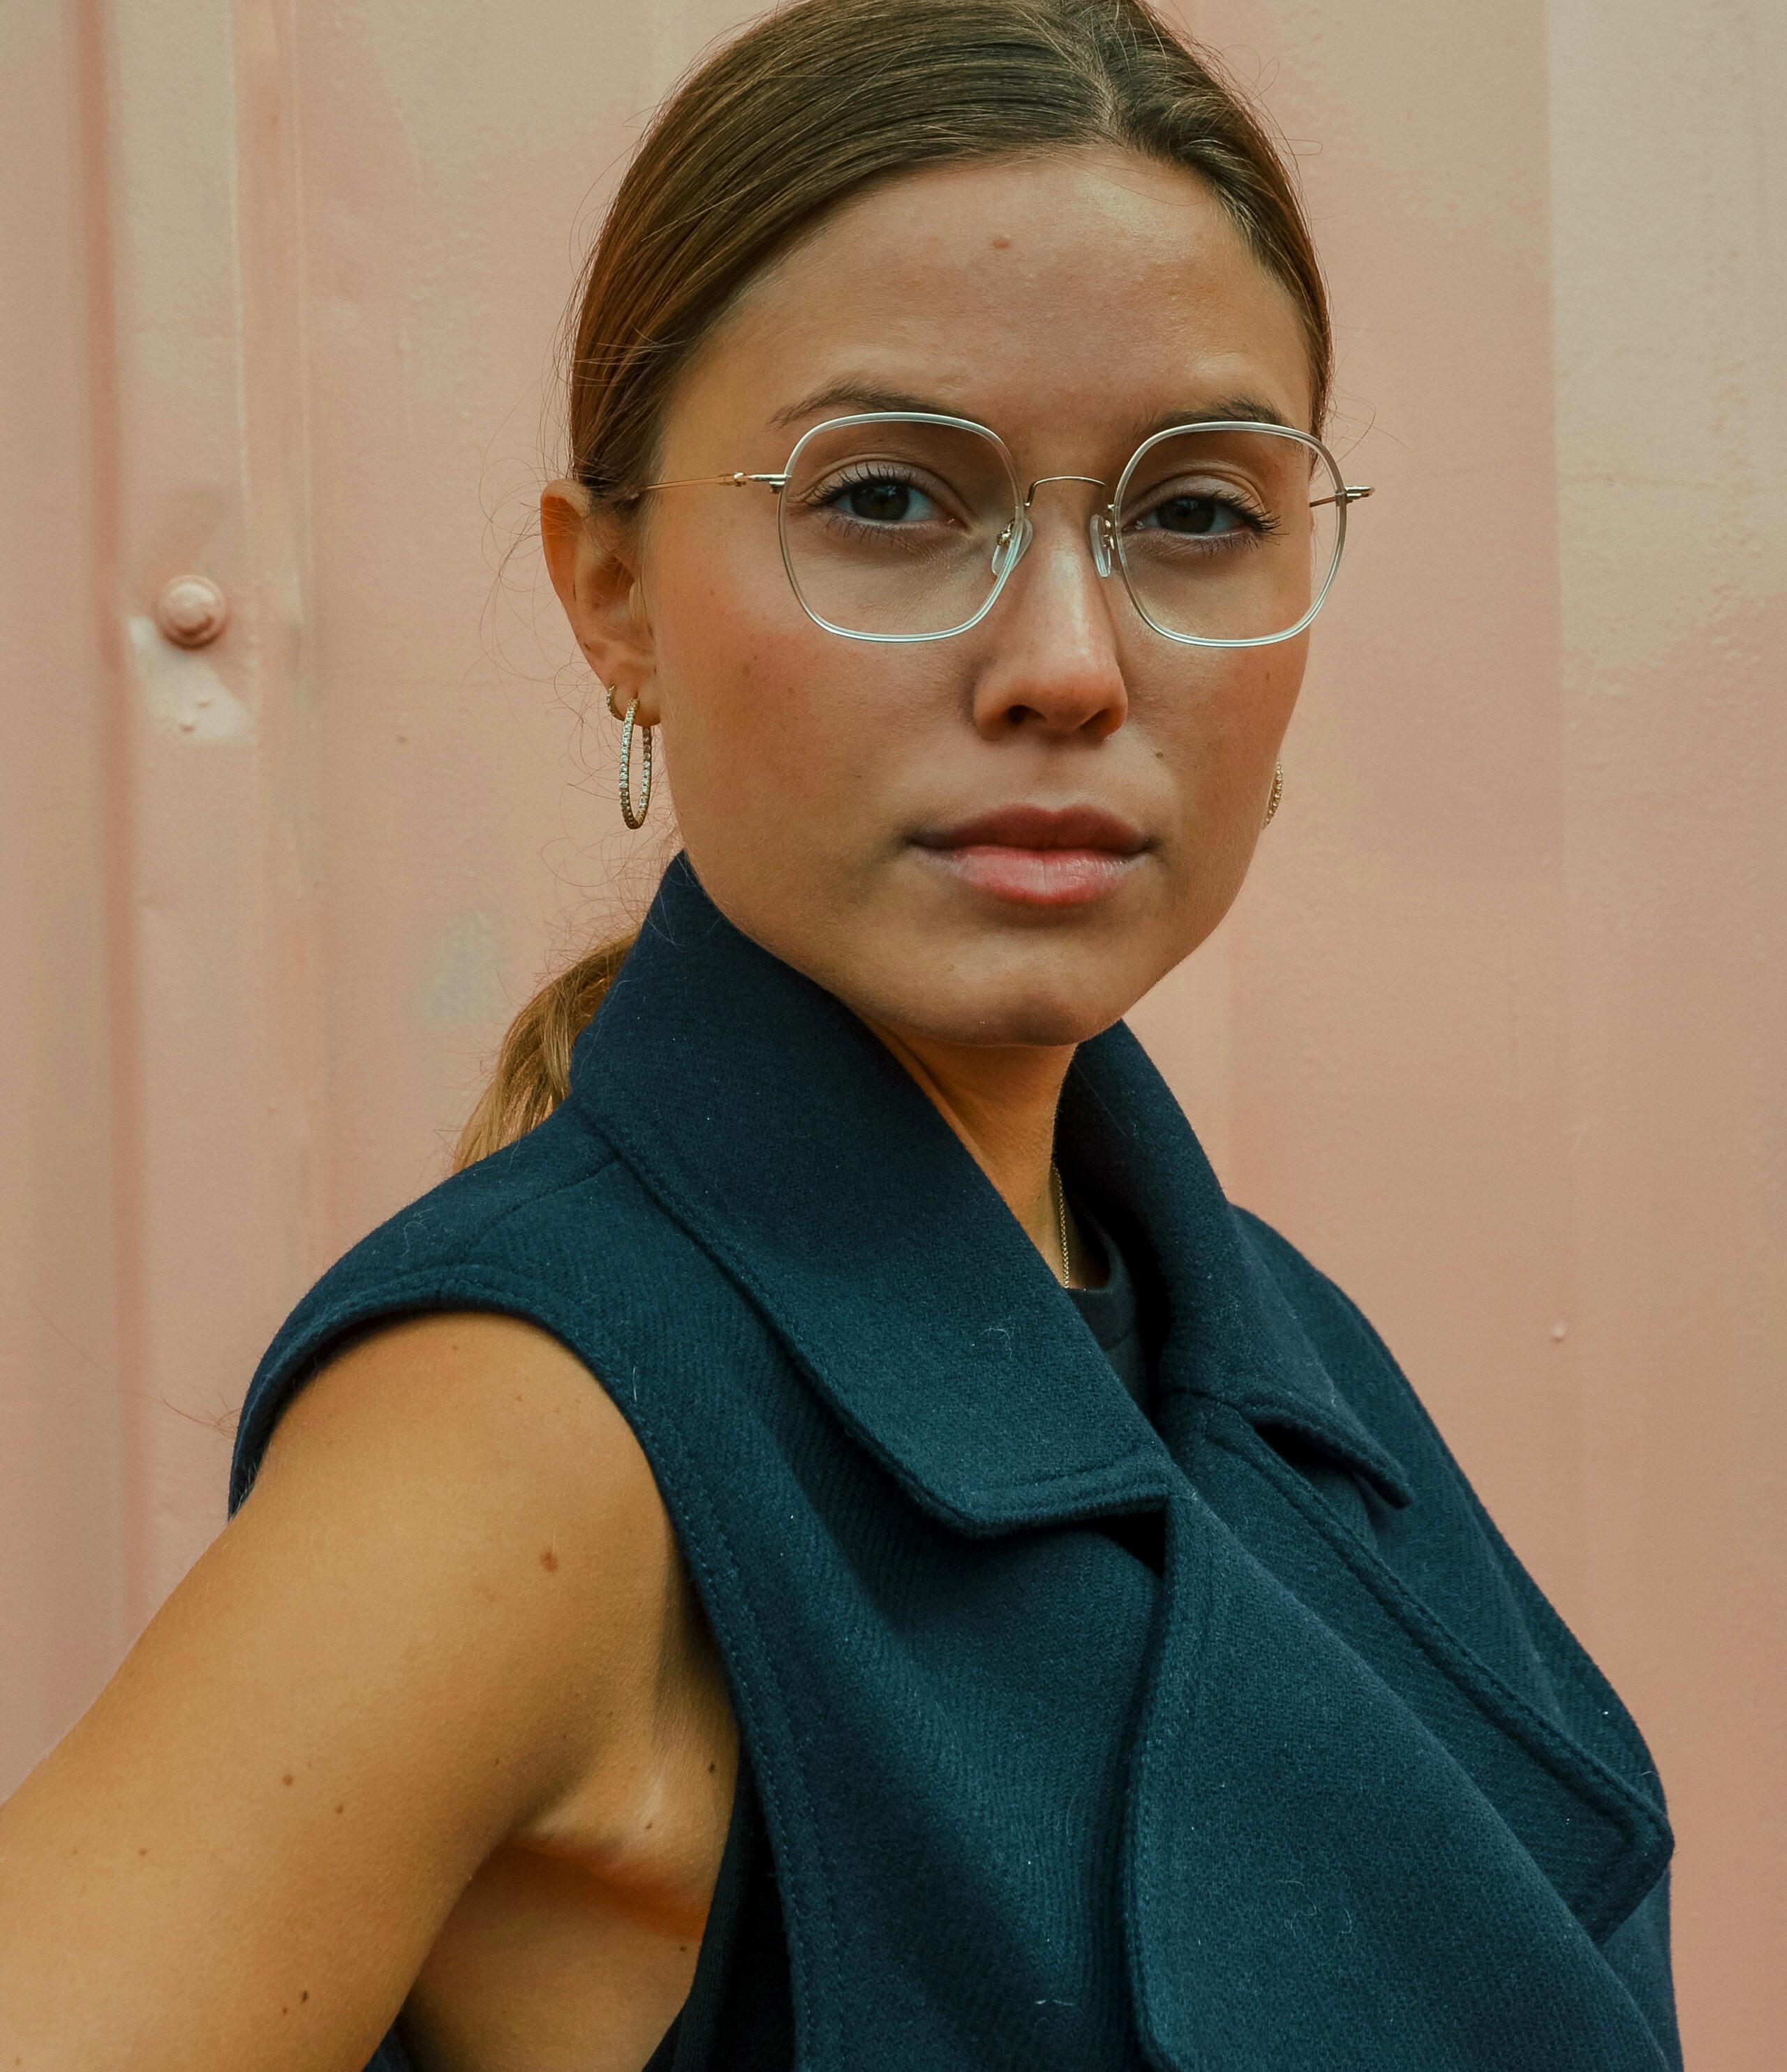 Tweede bril = 50 % korting op je brilglazen • Frames and Faces Deinze